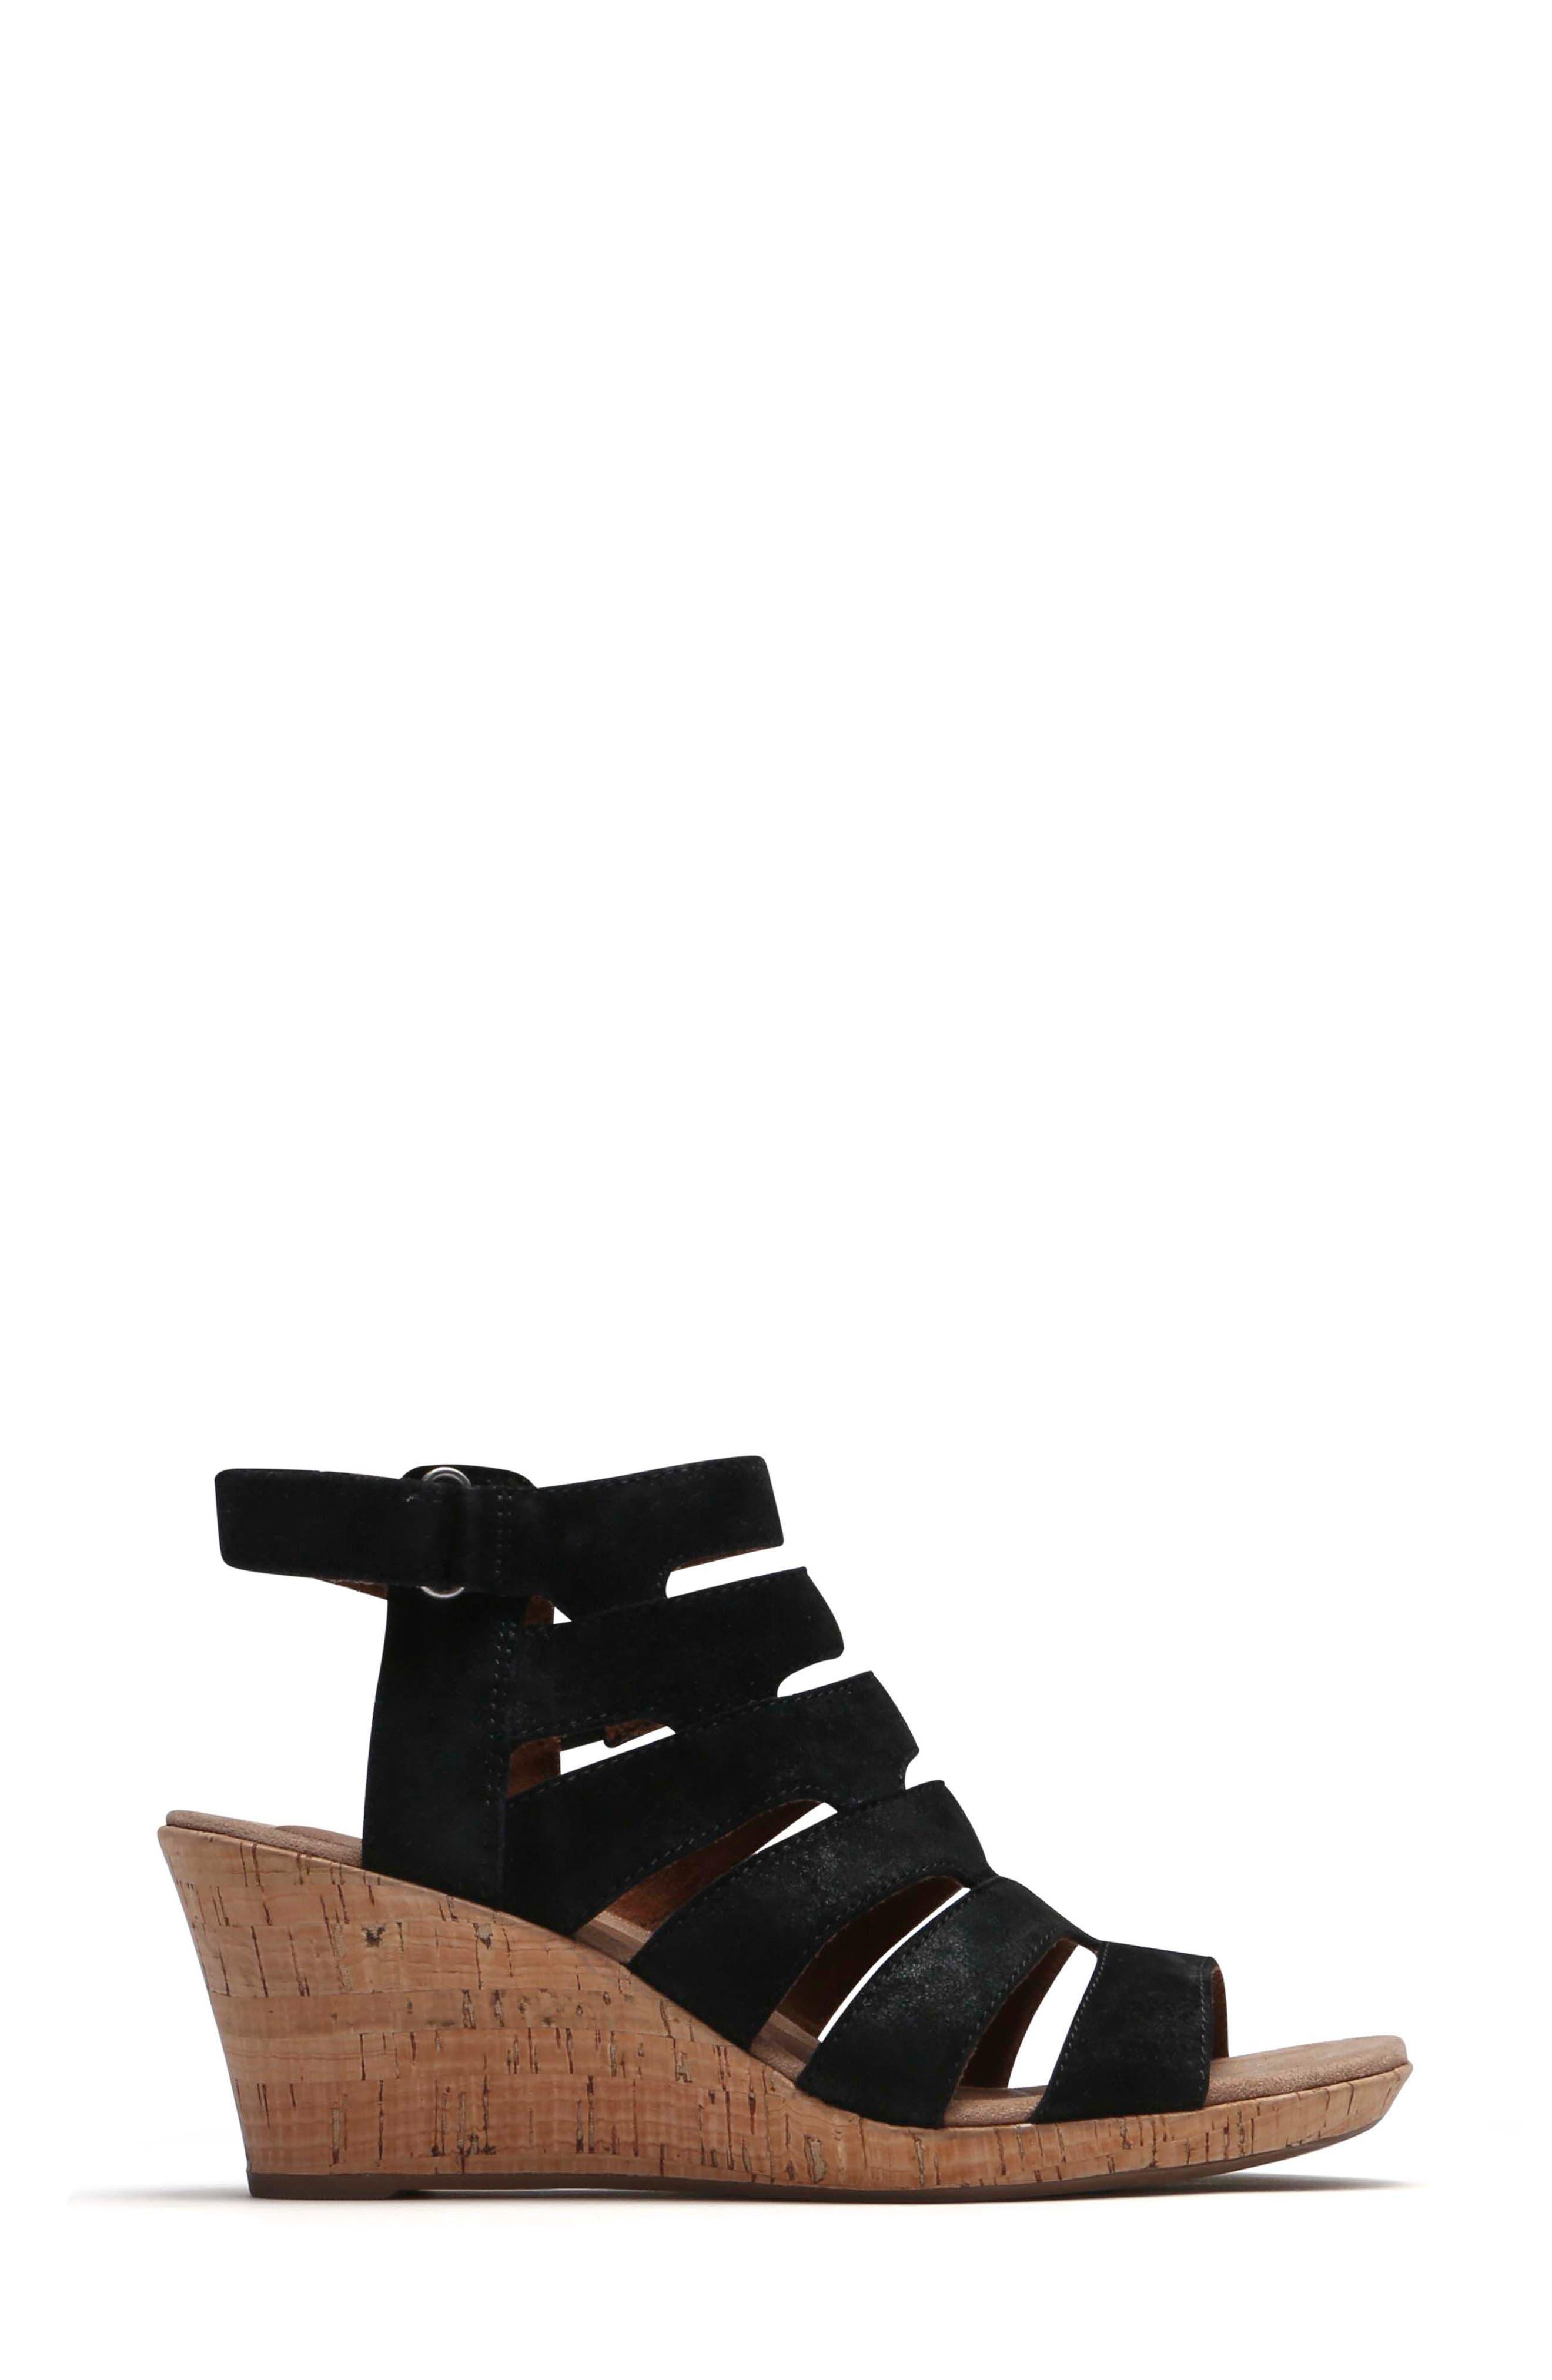 Janna Asymmetrical Sandal,                             Alternate thumbnail 3, color,                             001